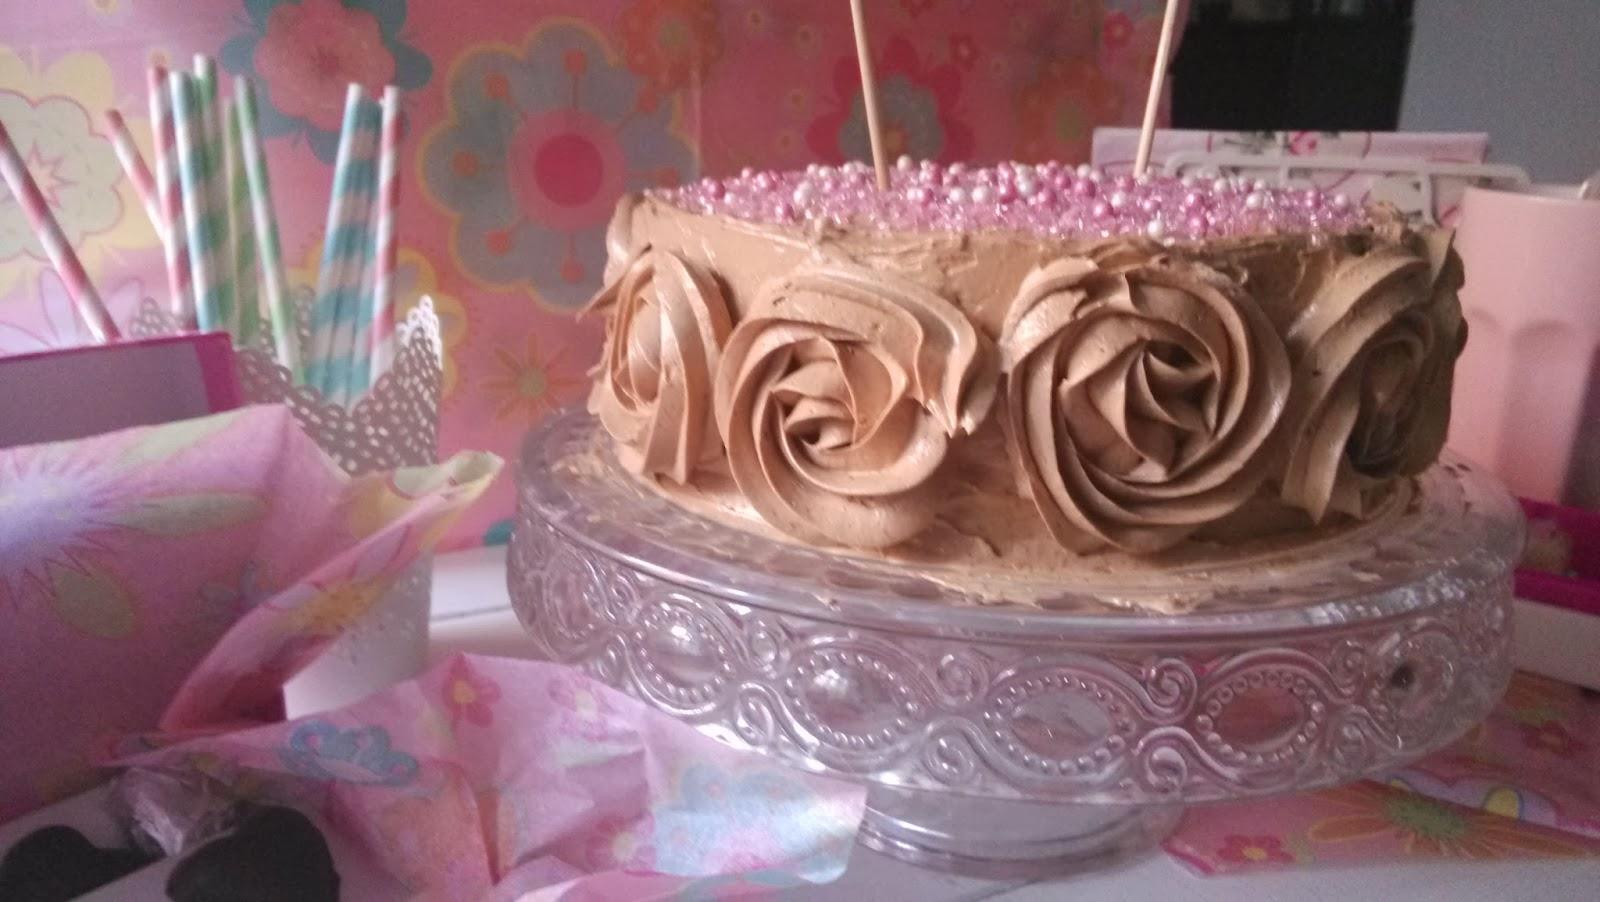 http://petitsweetann.blogspot.com.es/2014/01/tarta-de-cafe-y-chocolate.html